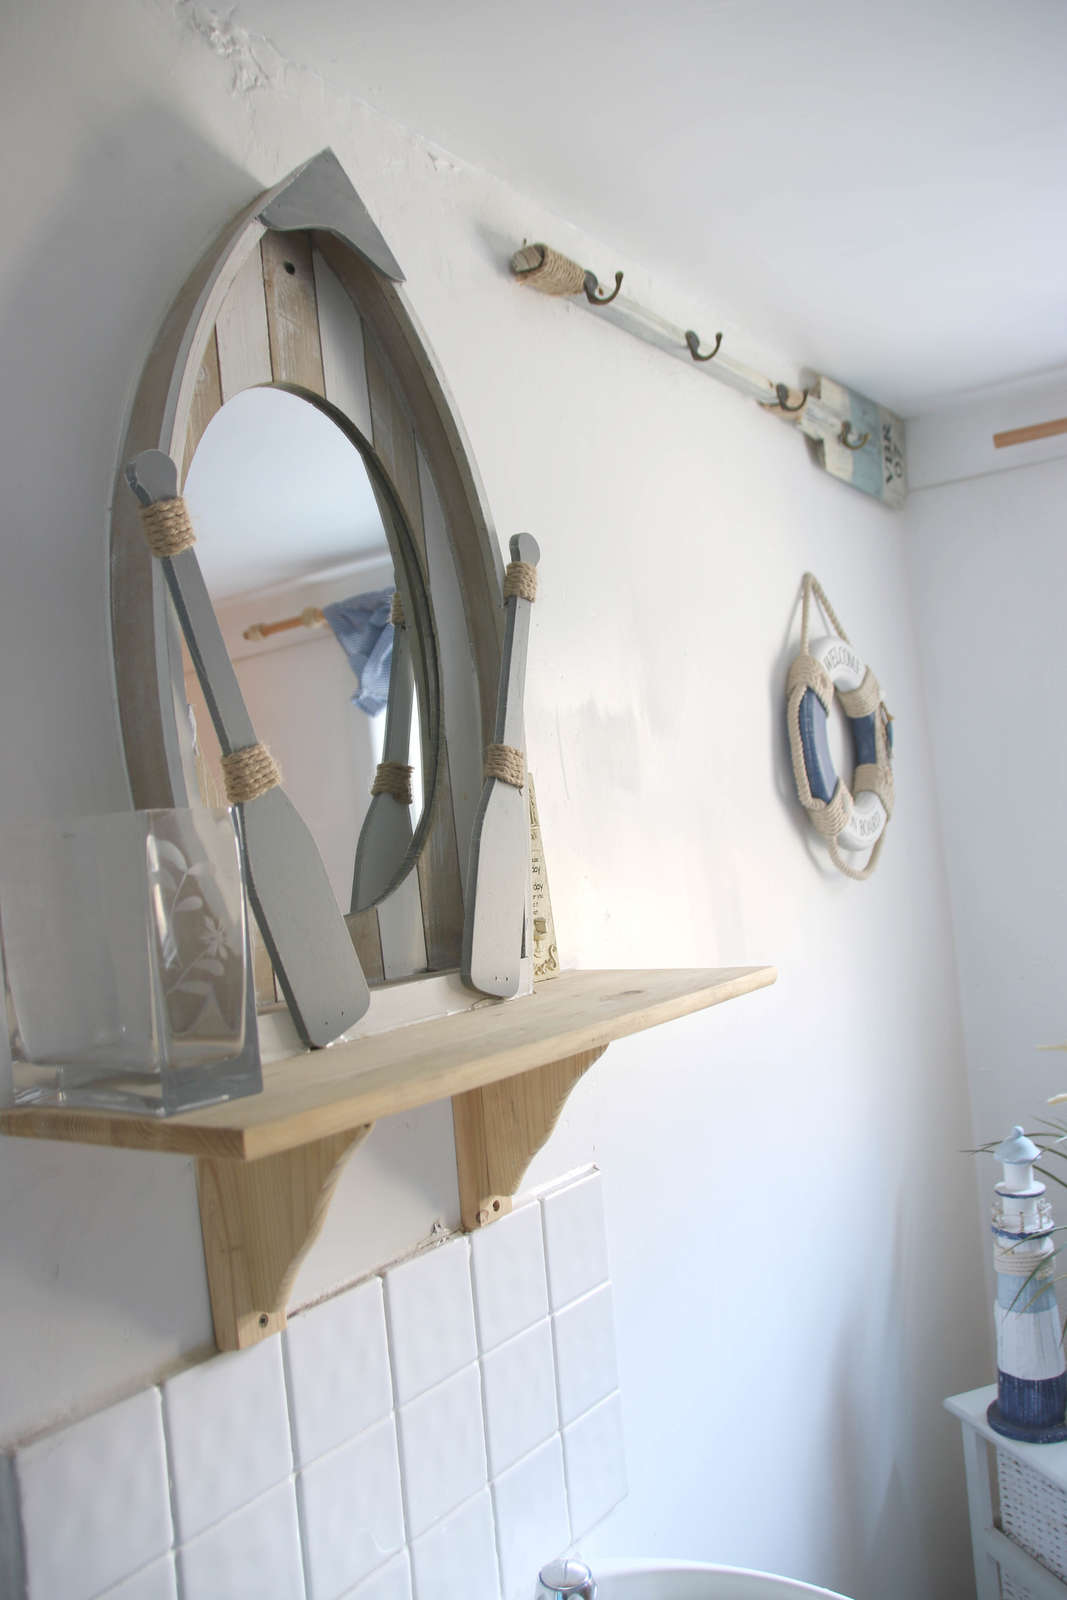 Image details: bathroom mirror detail 002